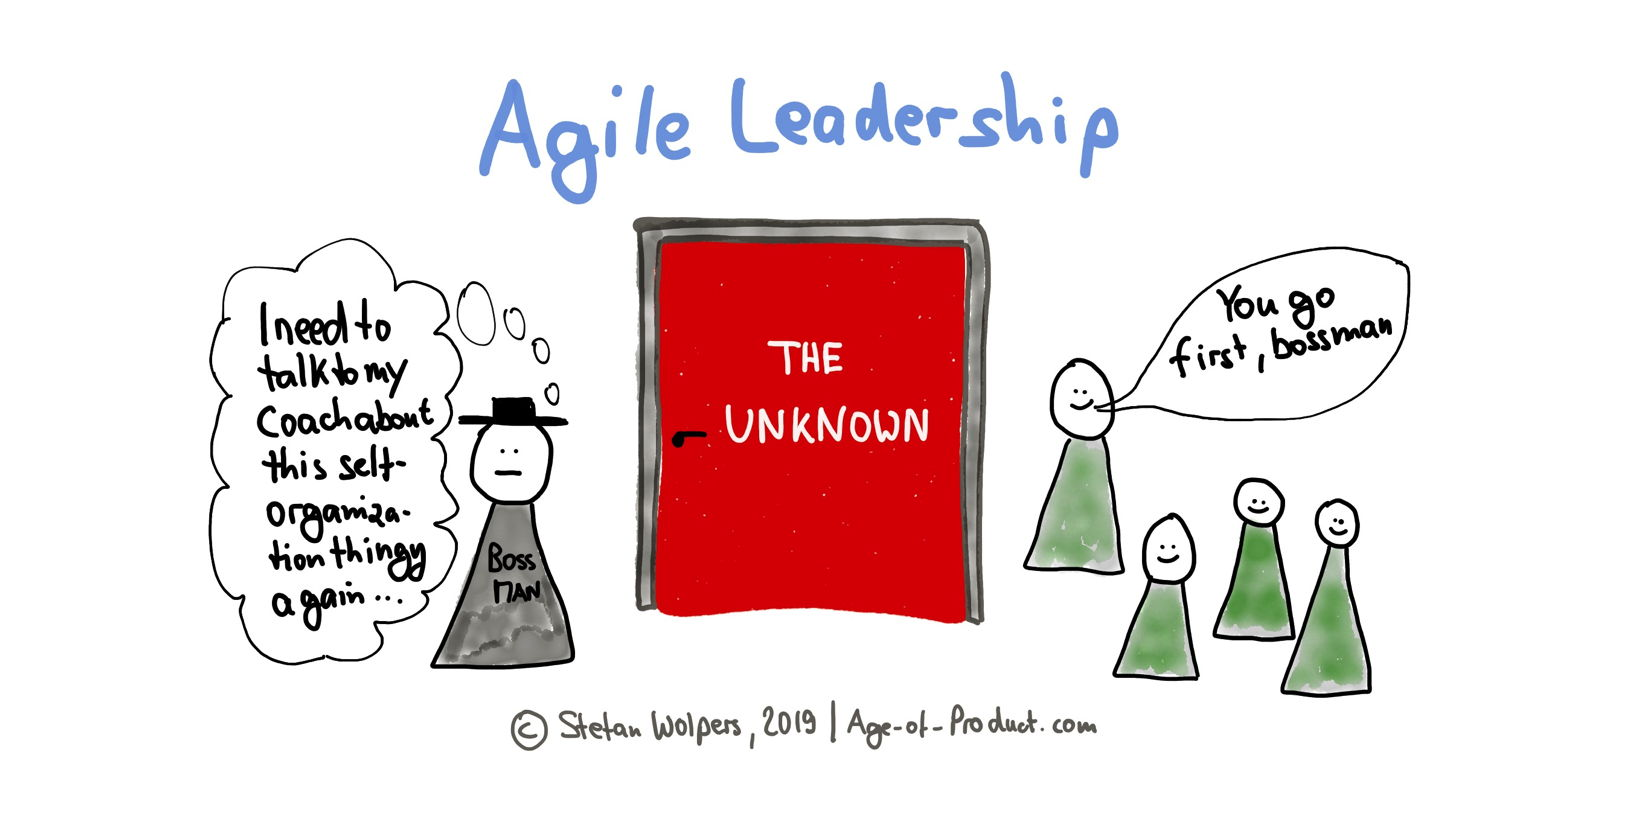 leadership in agile transformation